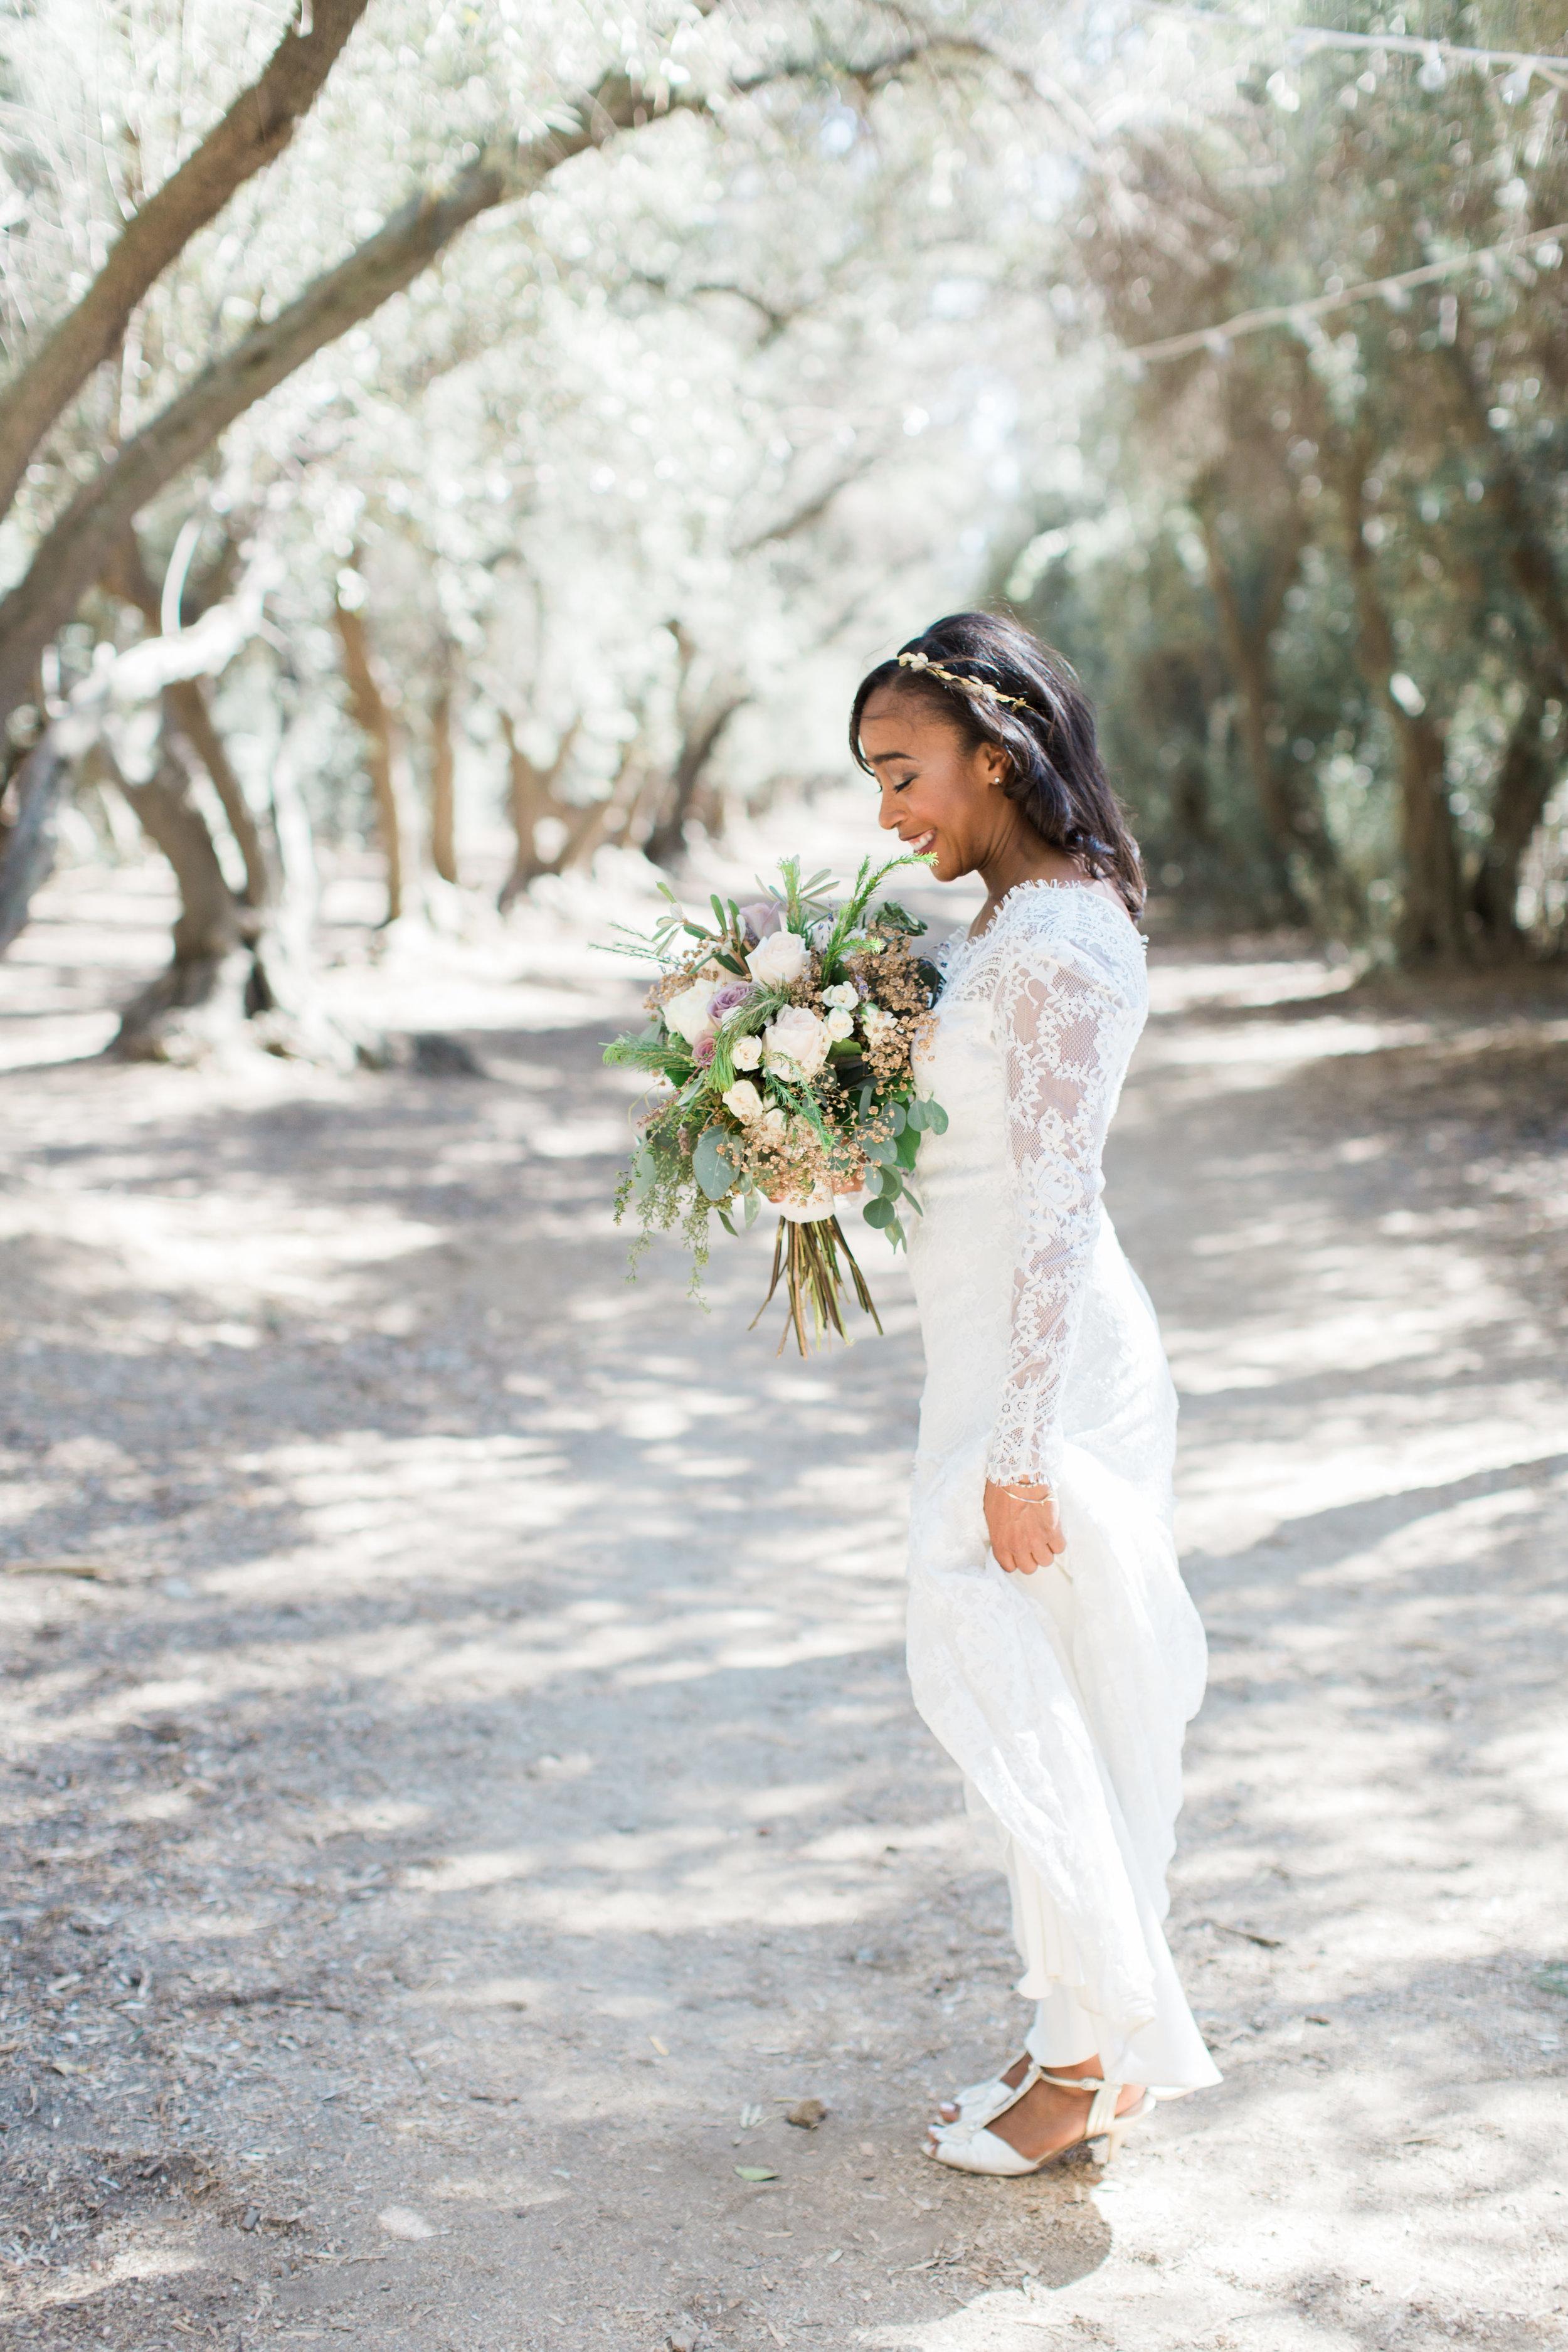 Jenny Quicksall Photography_www.jennyquicksall.com_California Wedding Photographer_Highland Springs Ranch and Inn Resort_Cherry Valley California (18).JPG